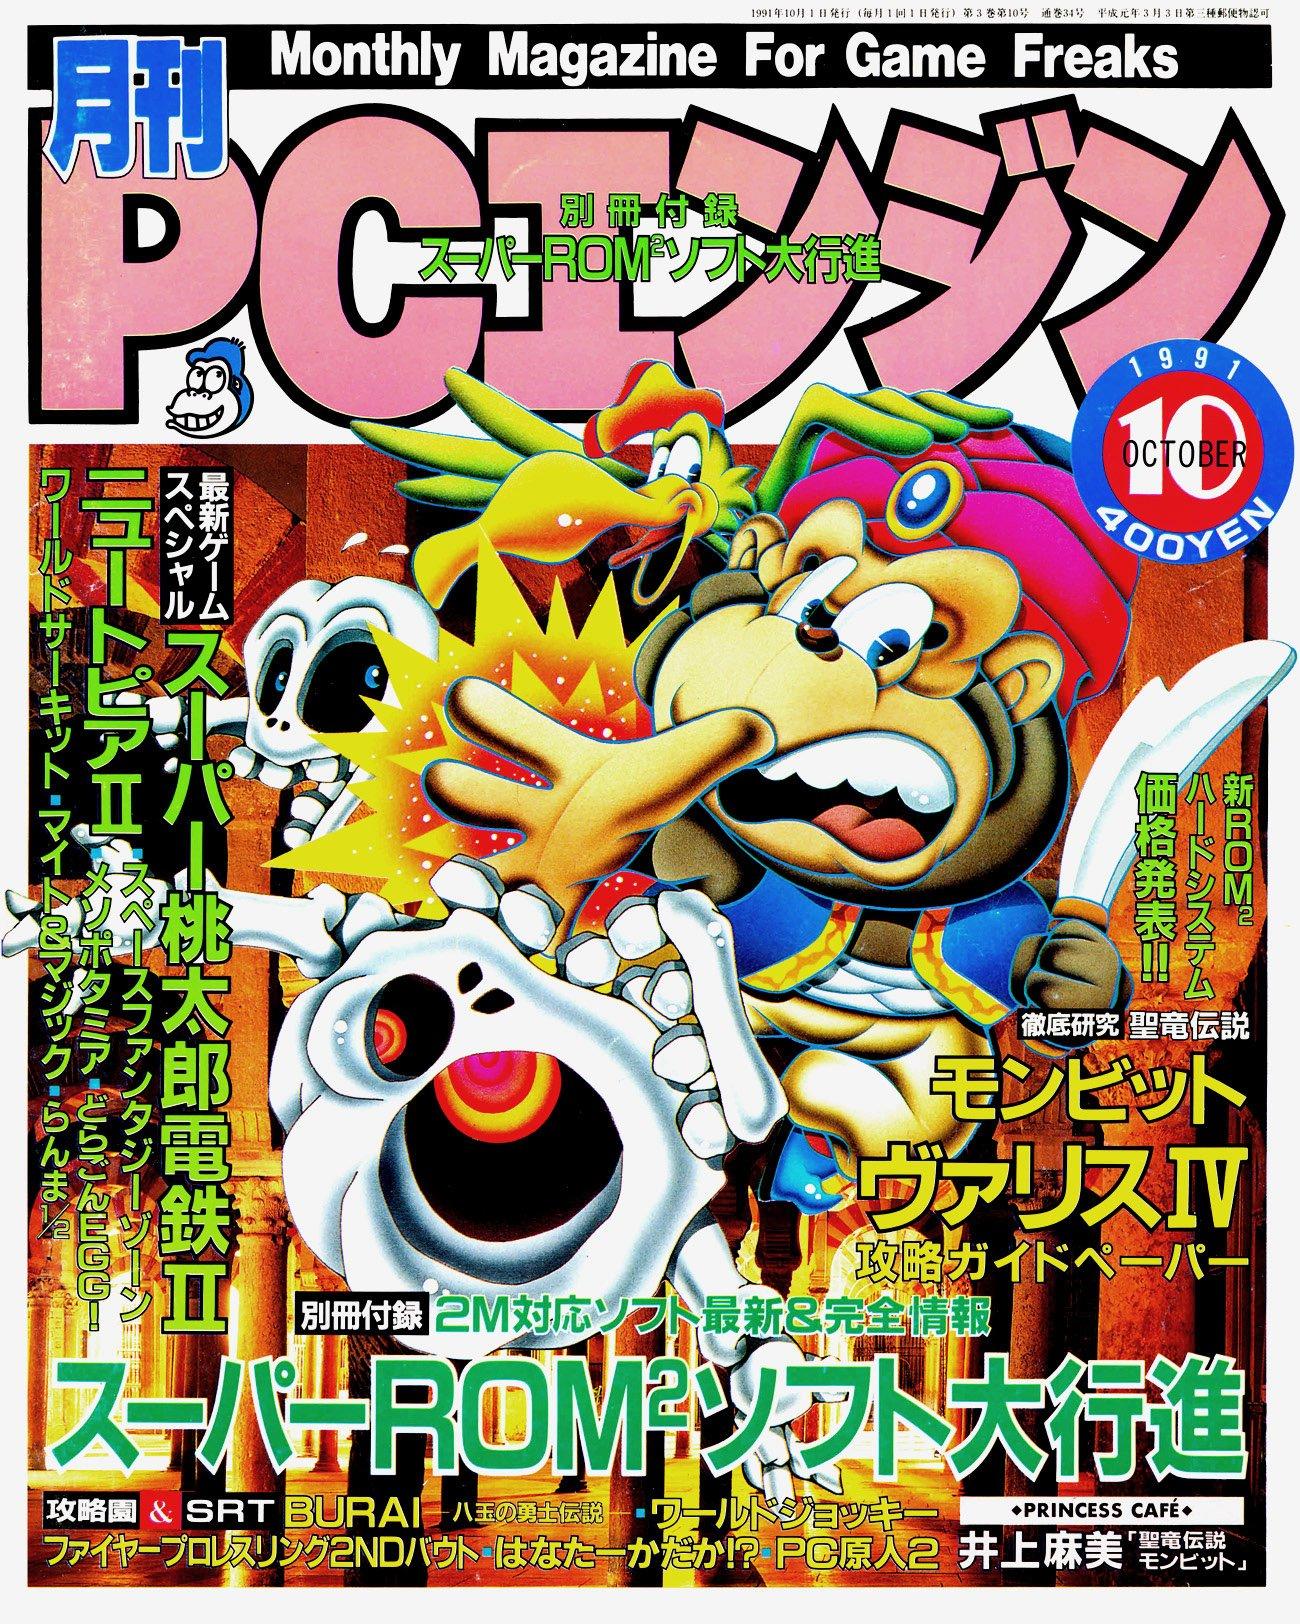 Gekkan PC Engine Issue 34 (October 1991)